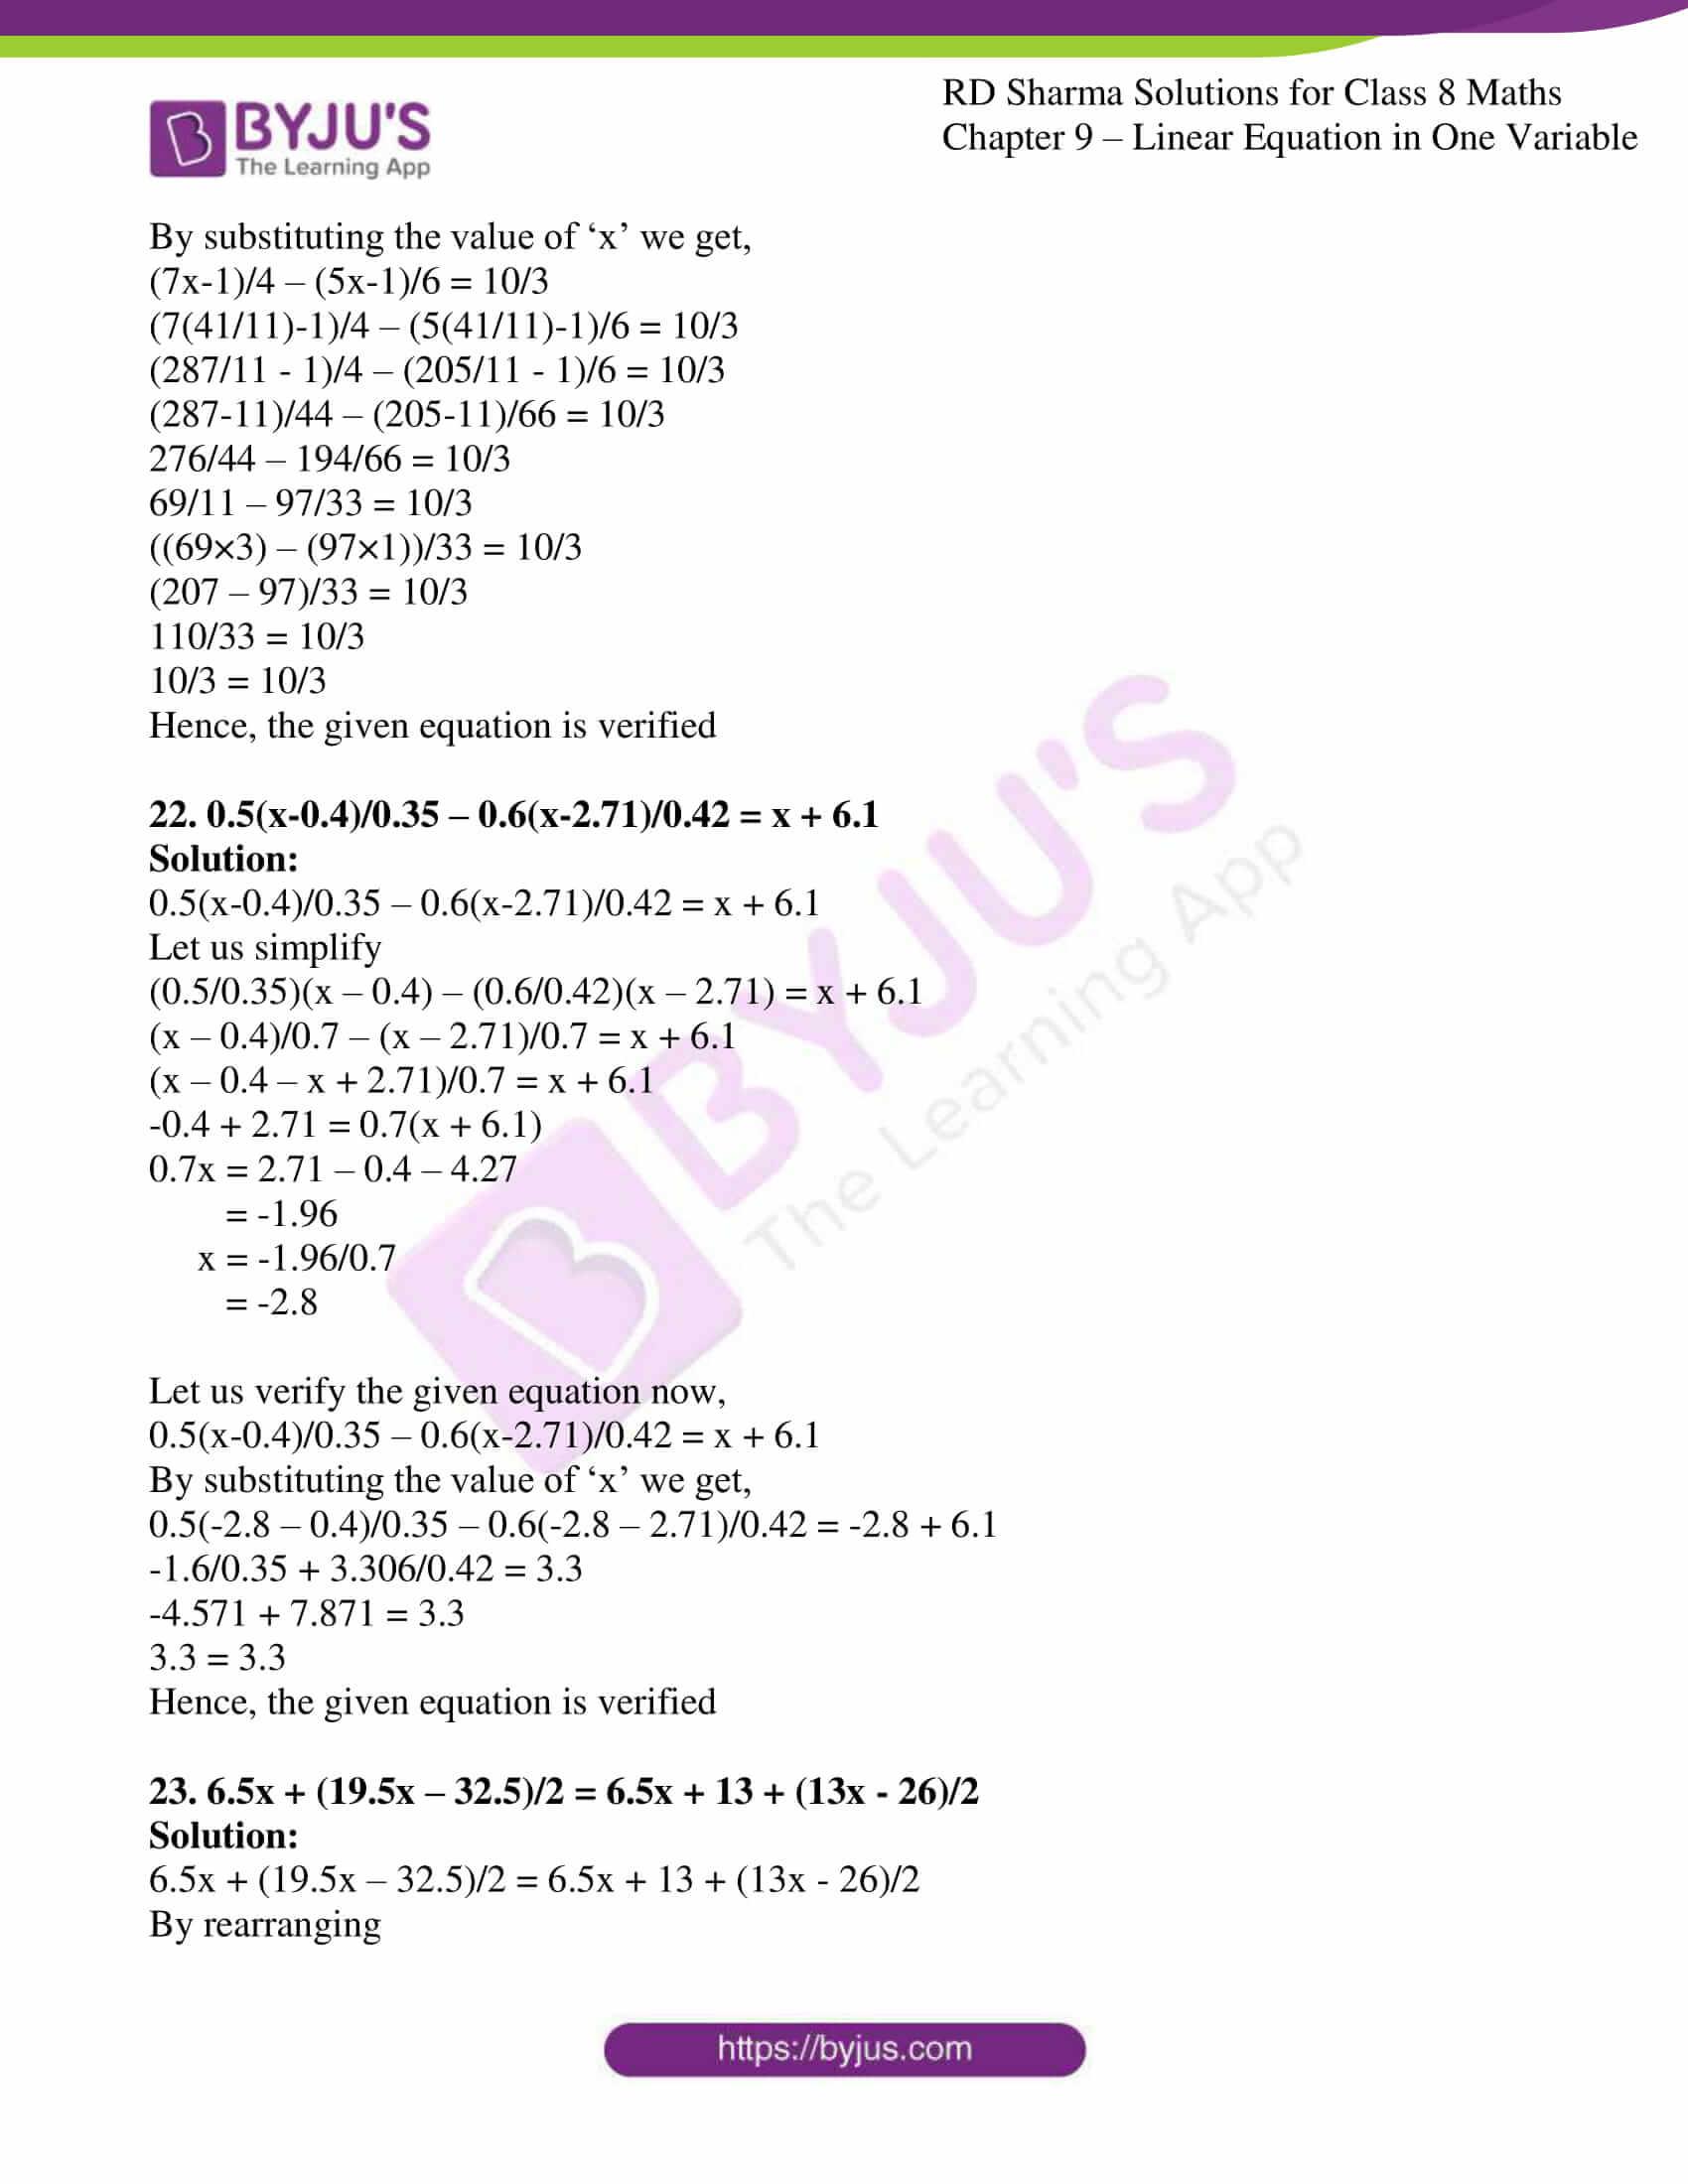 rd sharma class 8 maths chapter 9 exercise 2 14